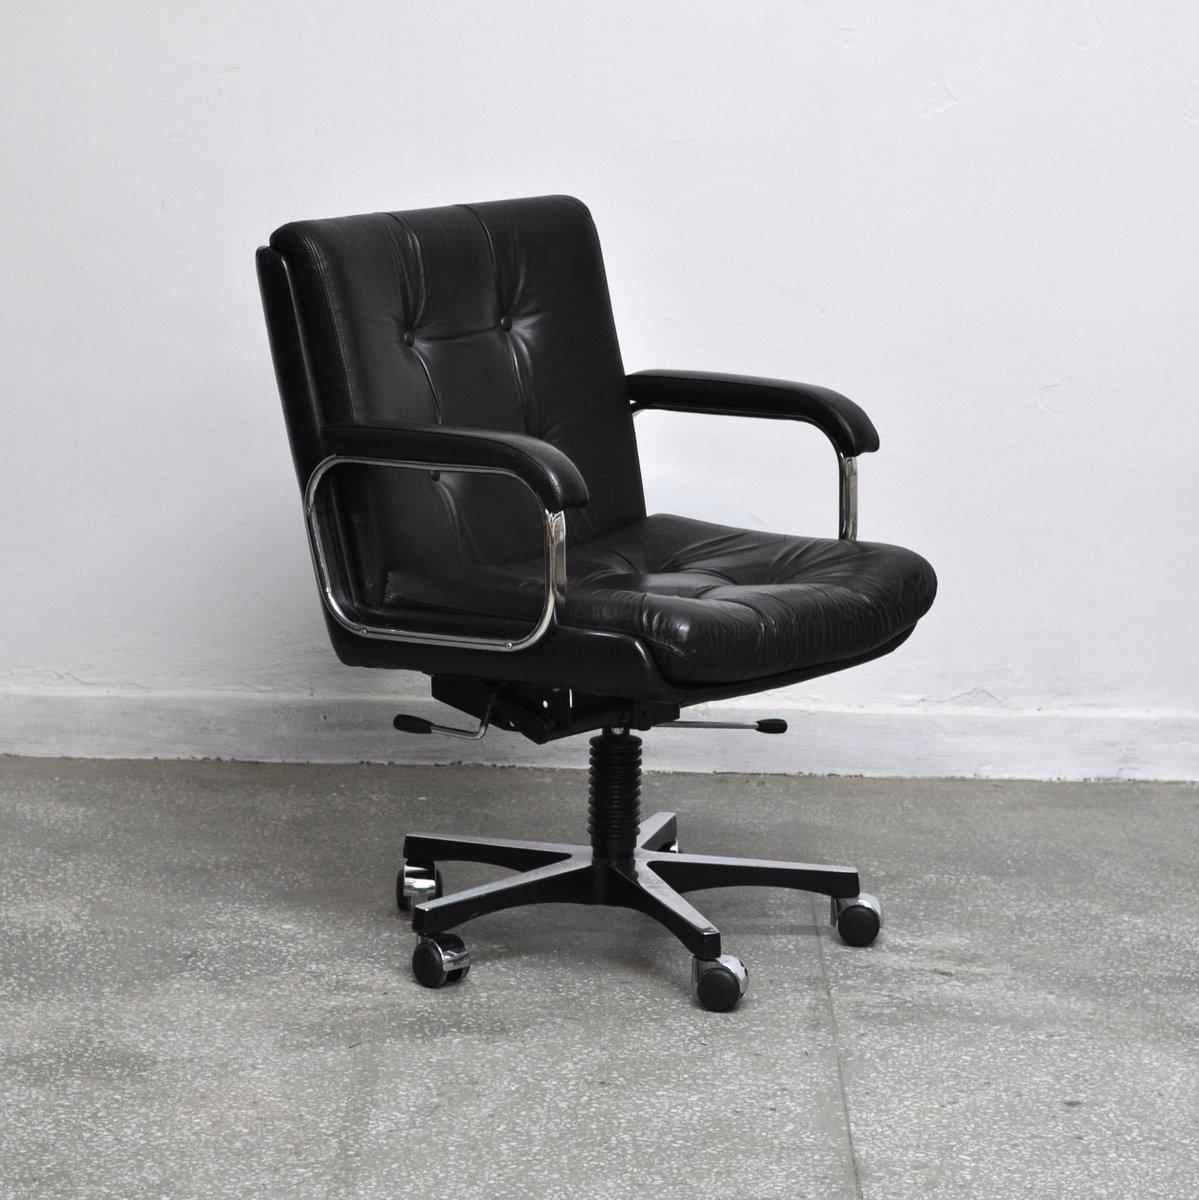 ergonomic chair norway air mattress bed vintage norwegian office from ring mekanikk for sale